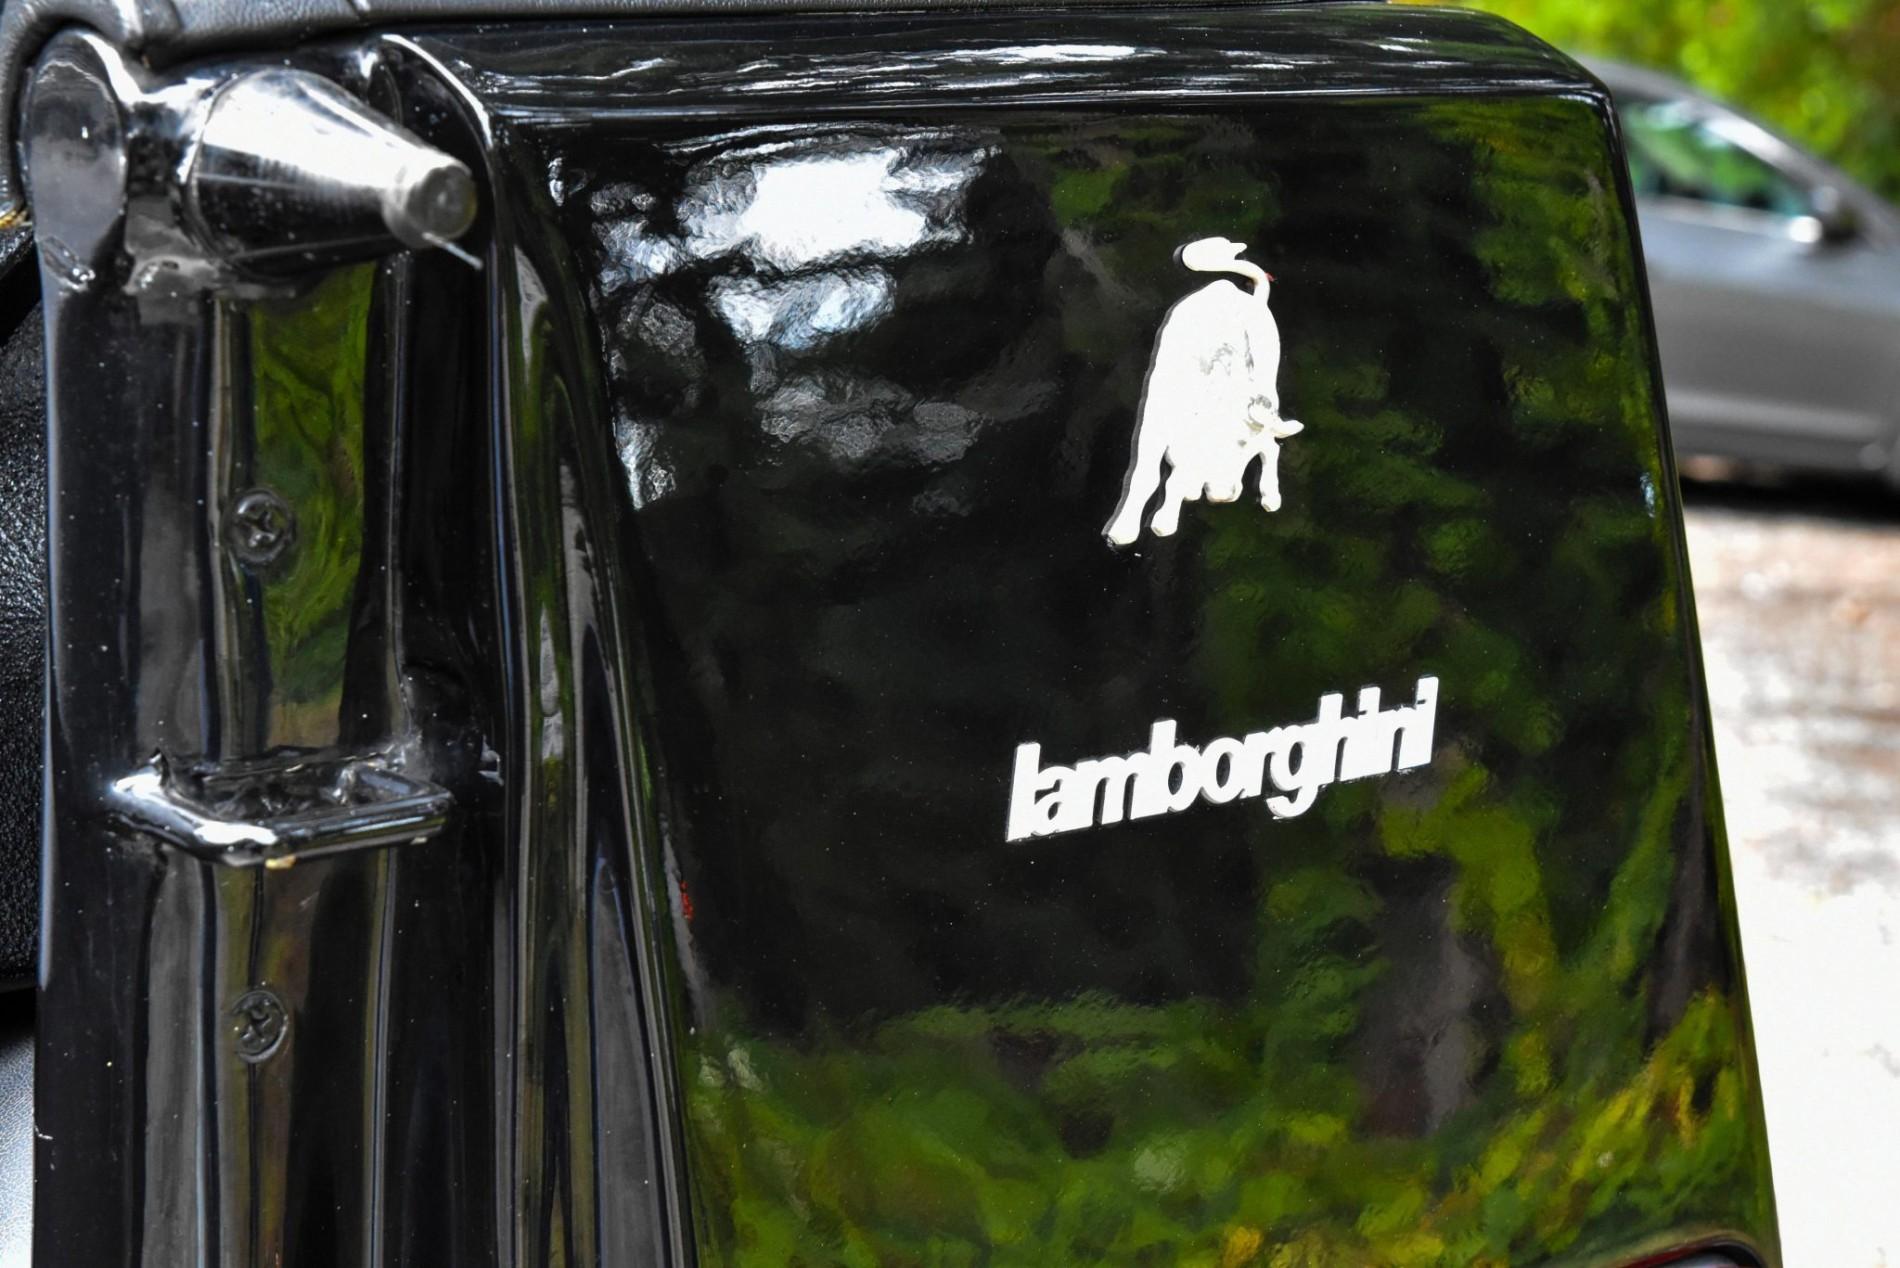 Lamborghini LM002 de vanzare - Lamborghini LM002 de vanzare